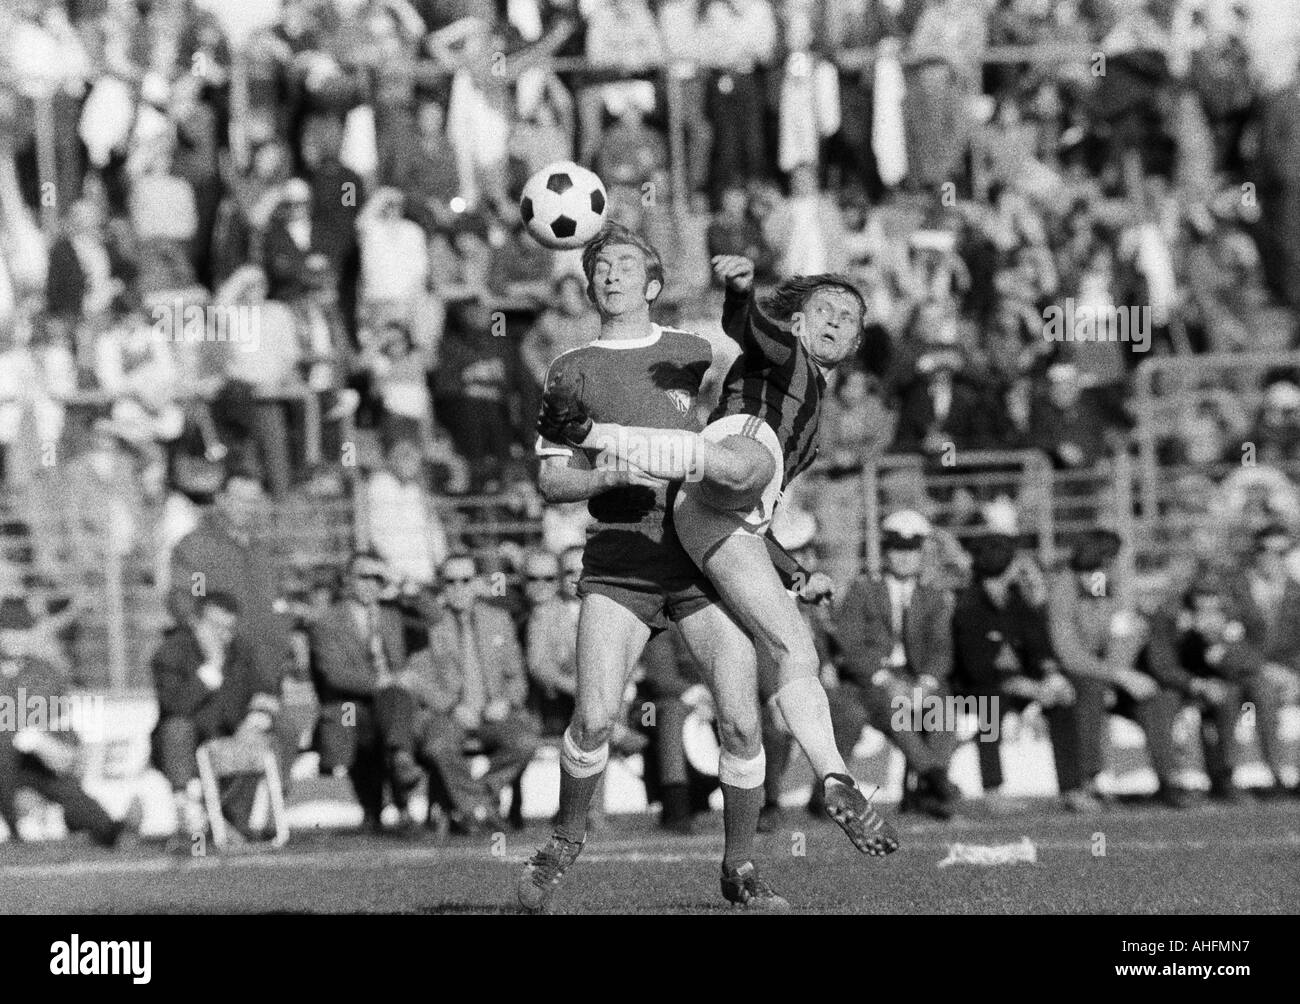 football, Bundesliga, 1971/1972, VfL Bochum versus Hanover 96 2:2, Stadium at the Castroper Strasse in Bochum, scene of the match, duel between Manfred Ruesing (Bochum) left and Ferdinand Keller (96) - Stock Image